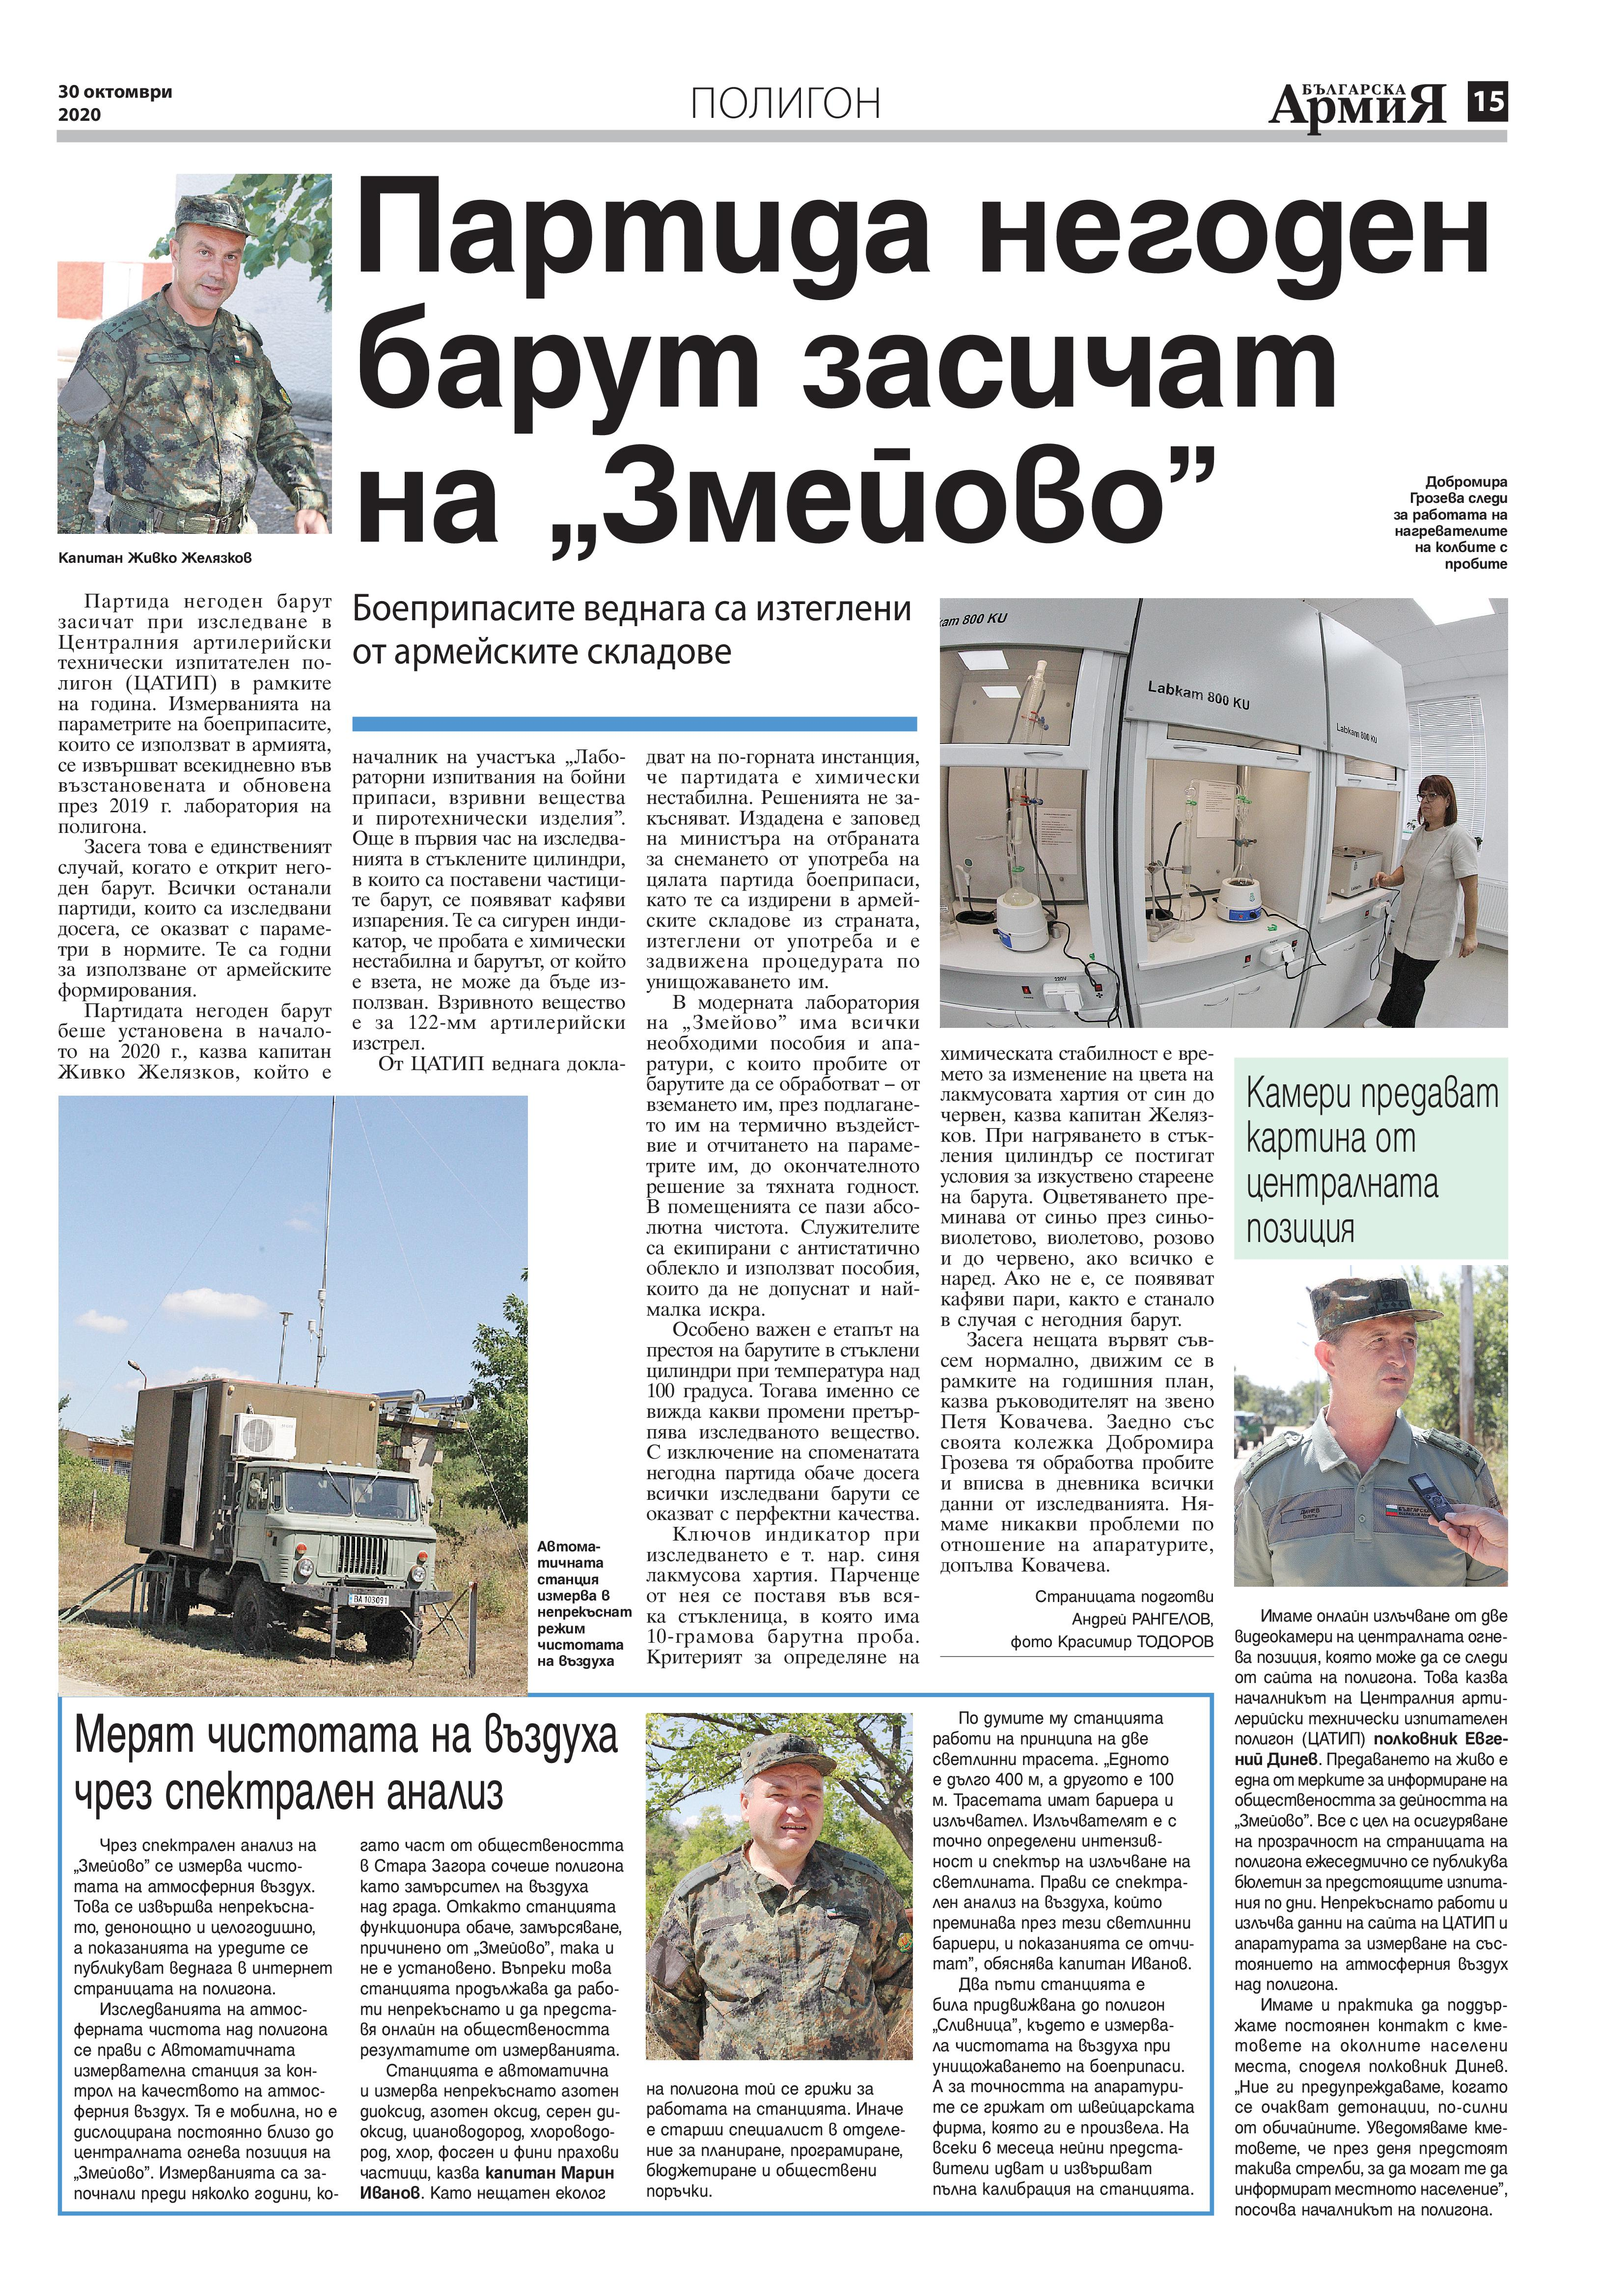 https://armymedia.bg/wp-content/uploads/2015/06/15-46.jpg